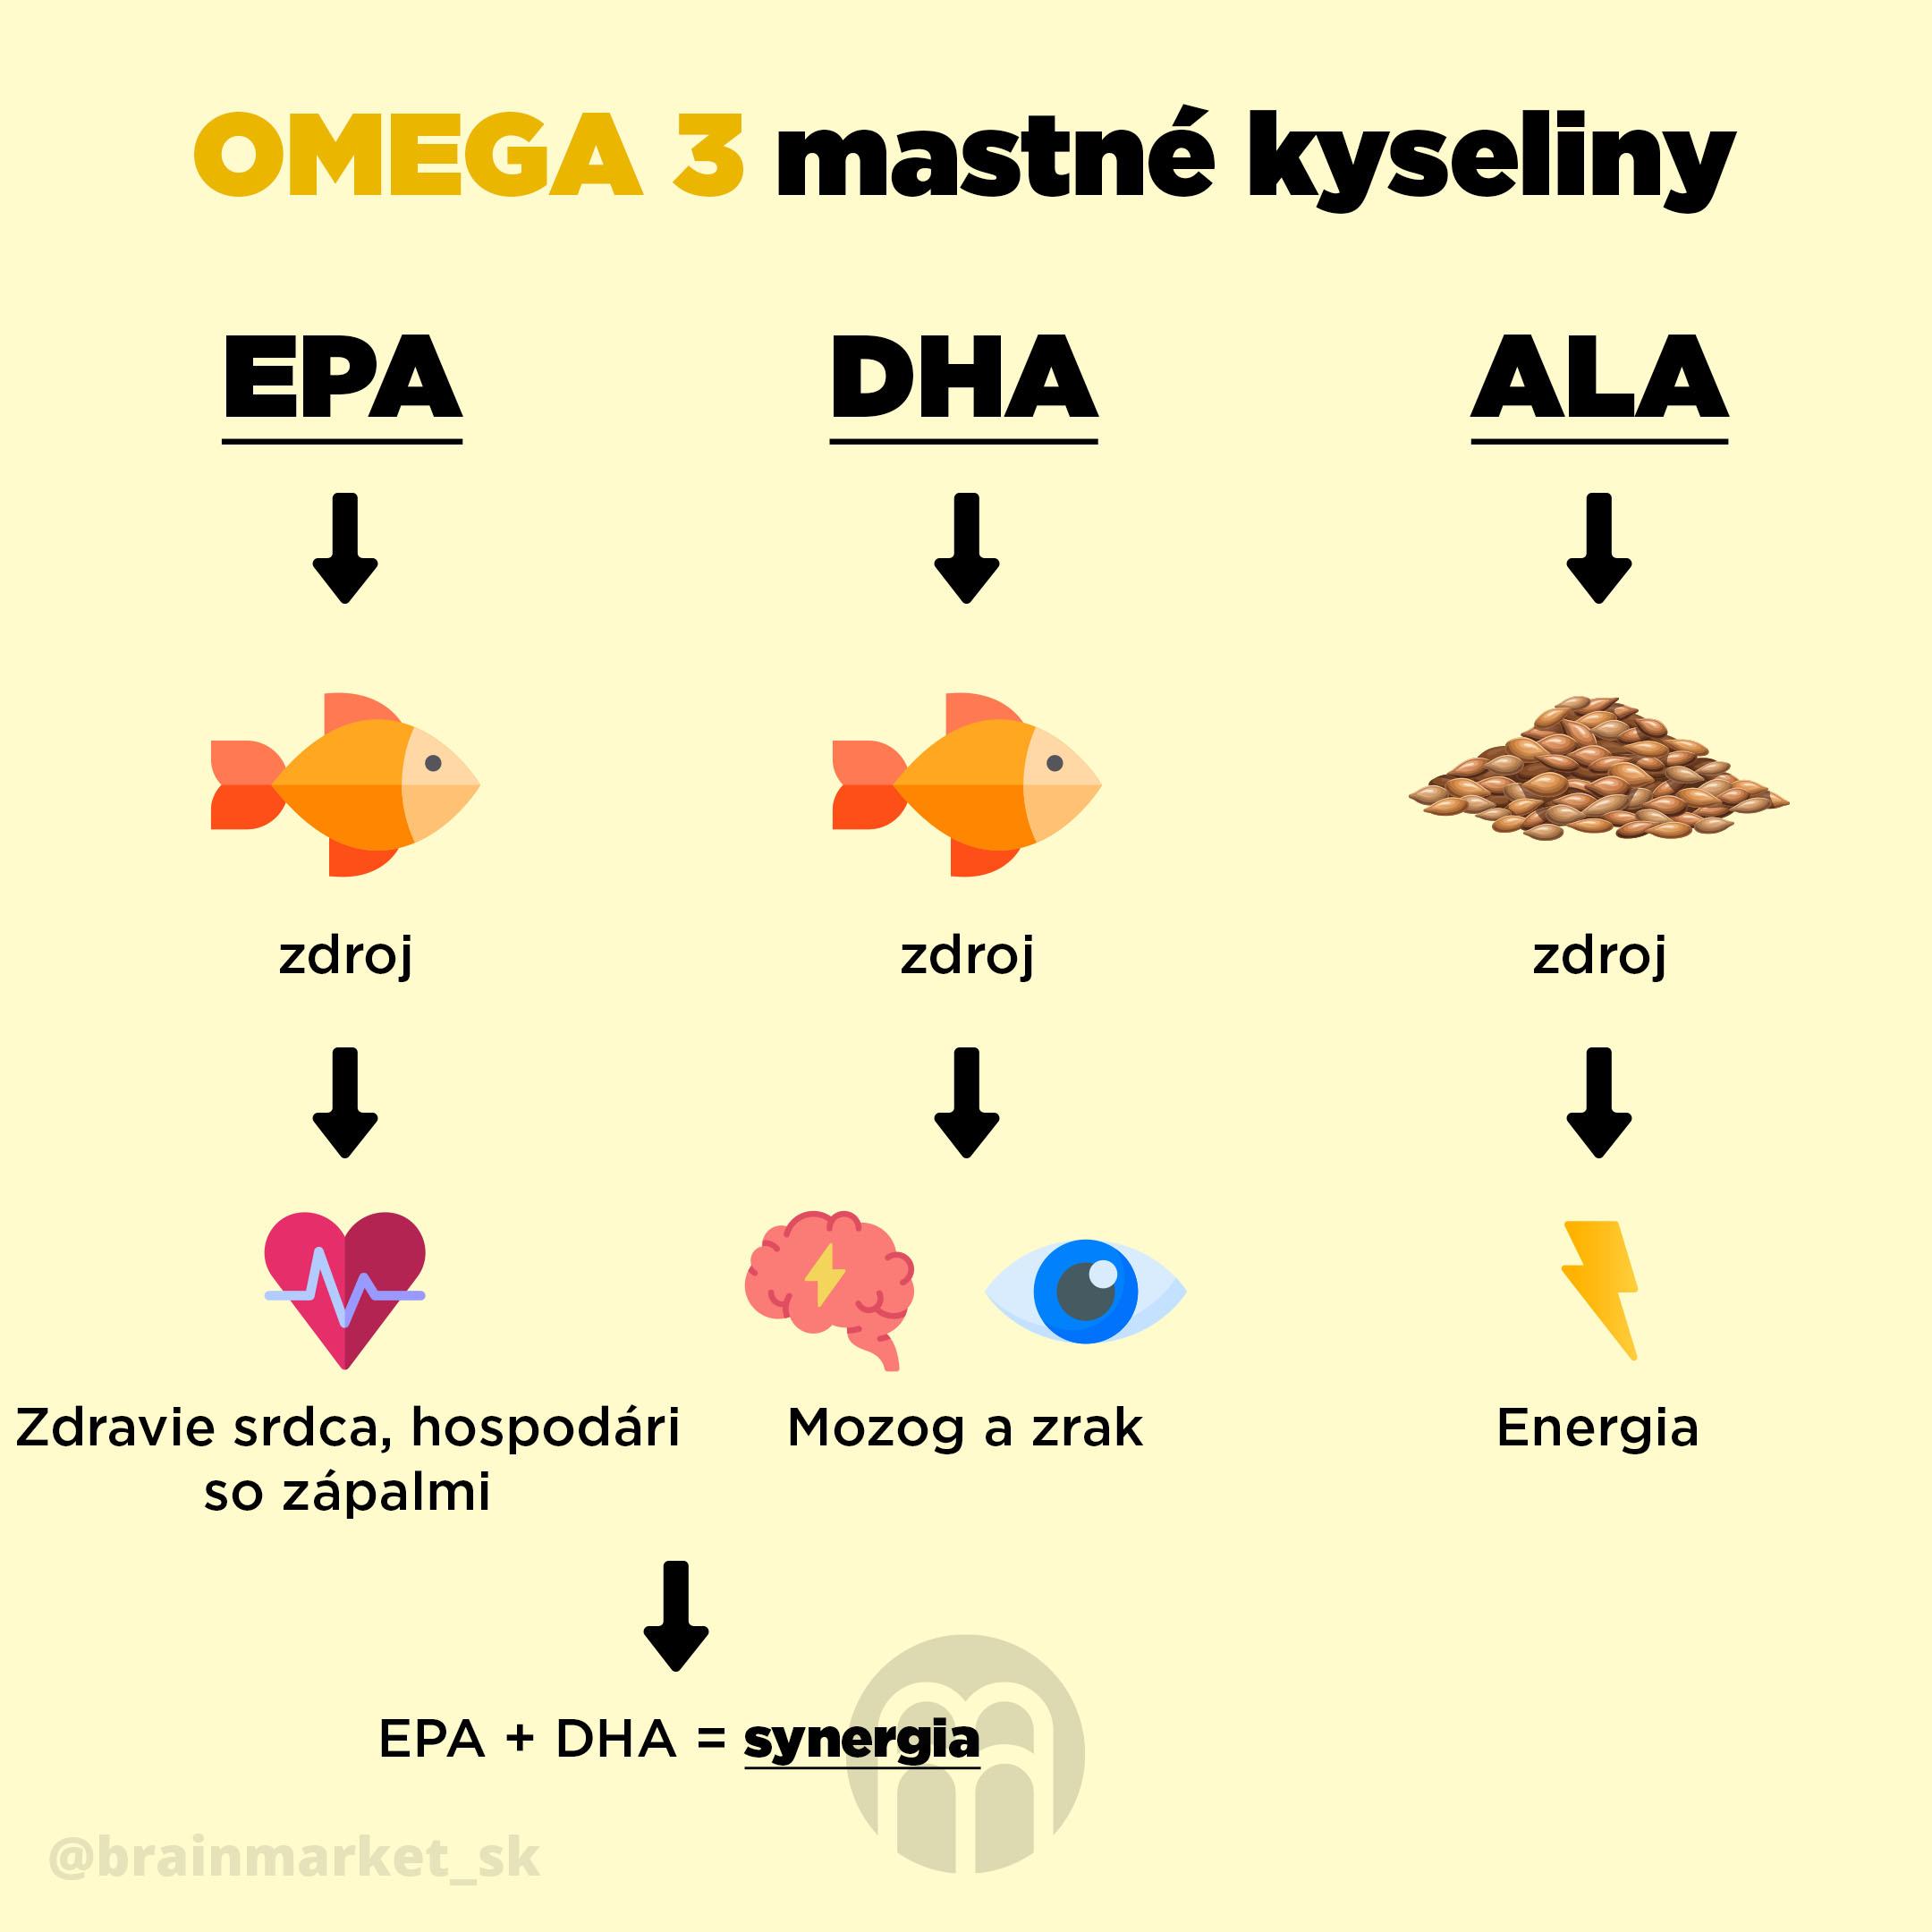 omega_3_mastne_kyseliny_infografika_brainmarket_SK